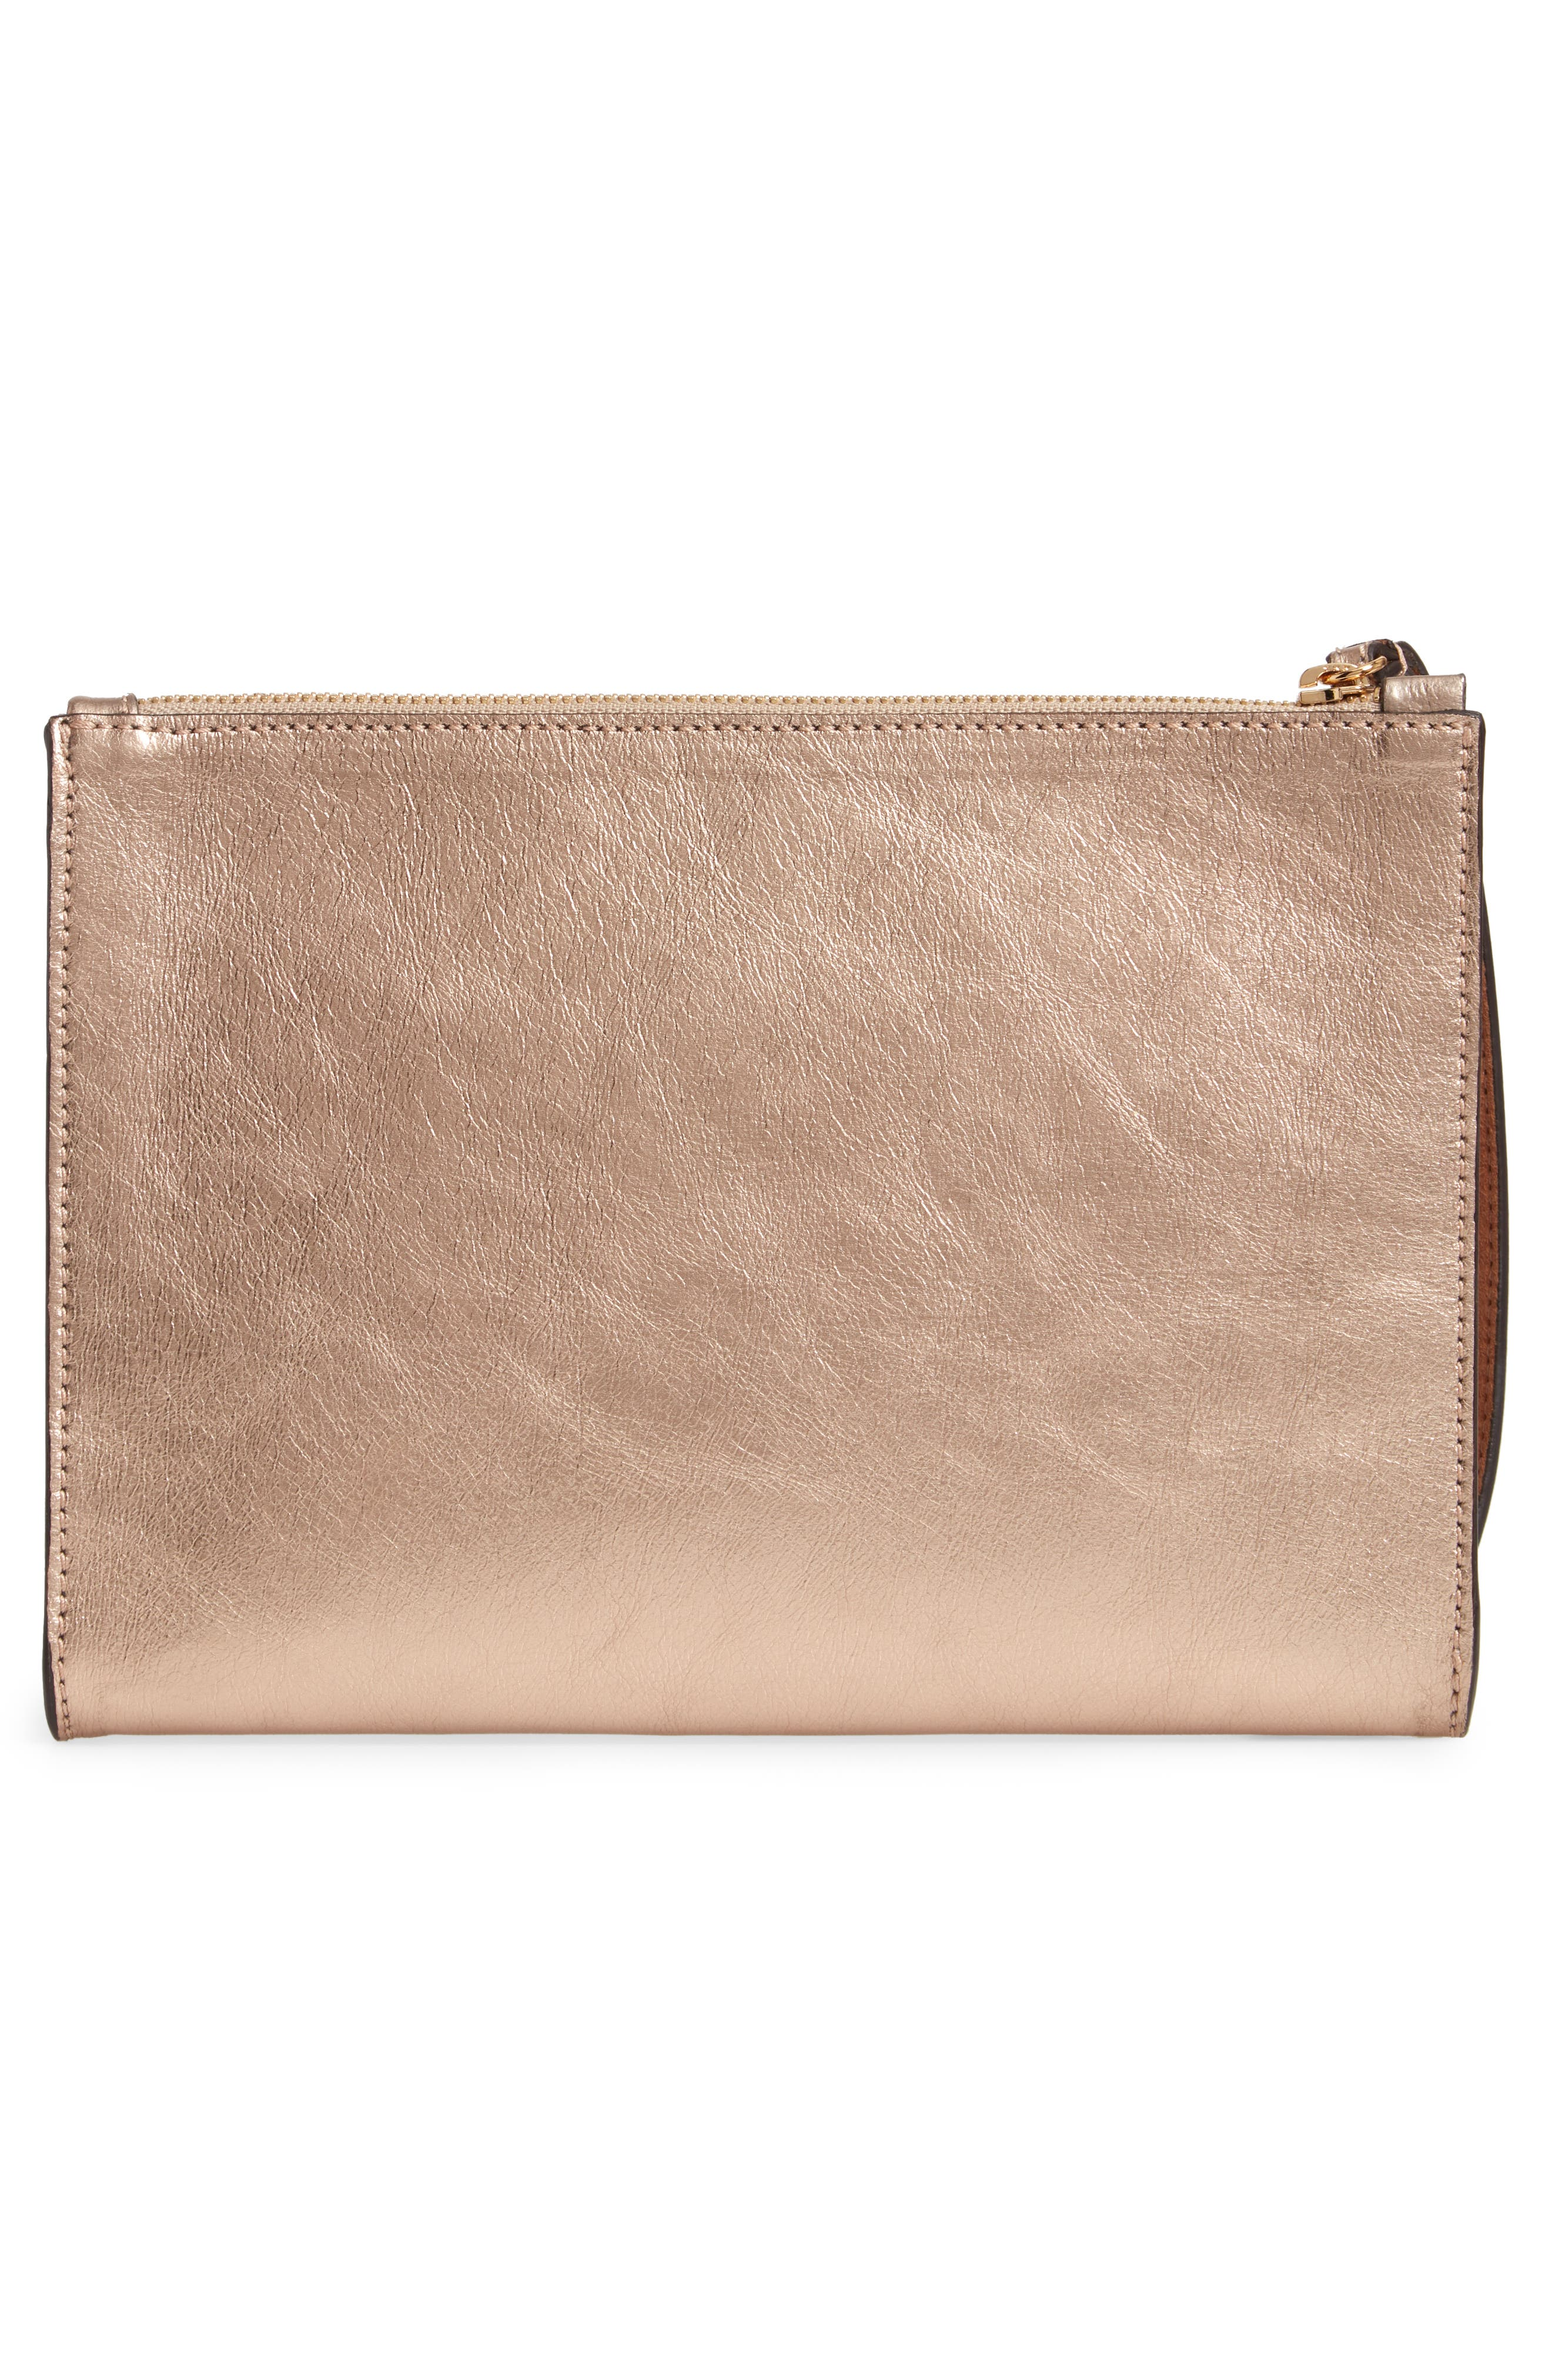 Metallic Faux Nappa Leather Wristlet Clutch,                             Alternate thumbnail 3, color,                             ROSE GOLD